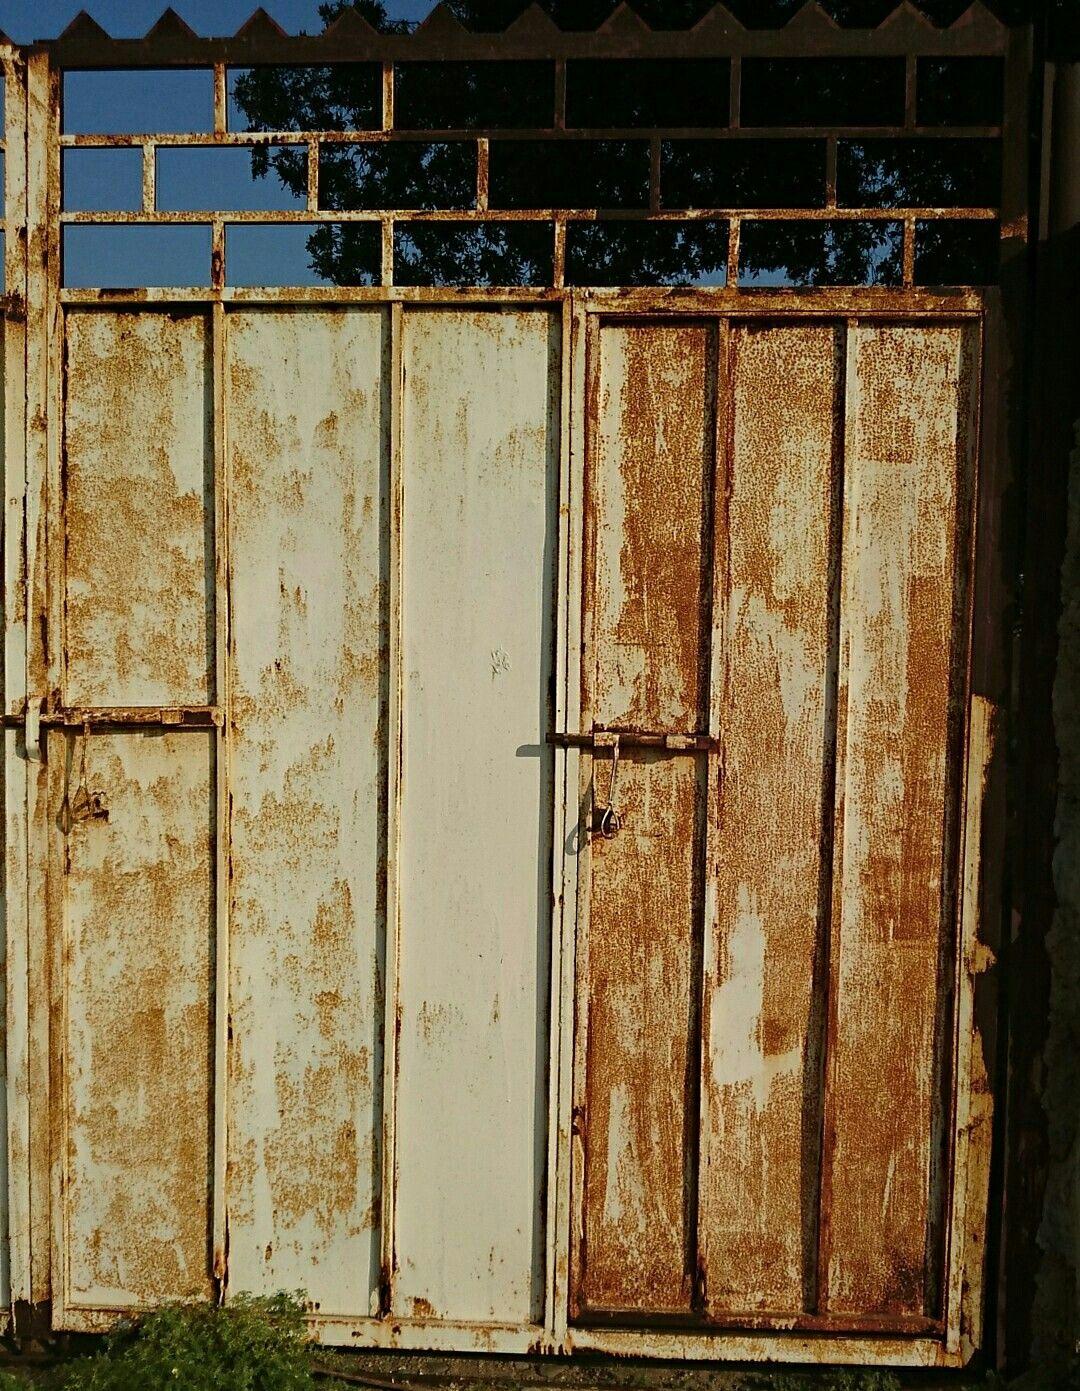 قديم قديمة تصويري Decor Home Decor Room Divider